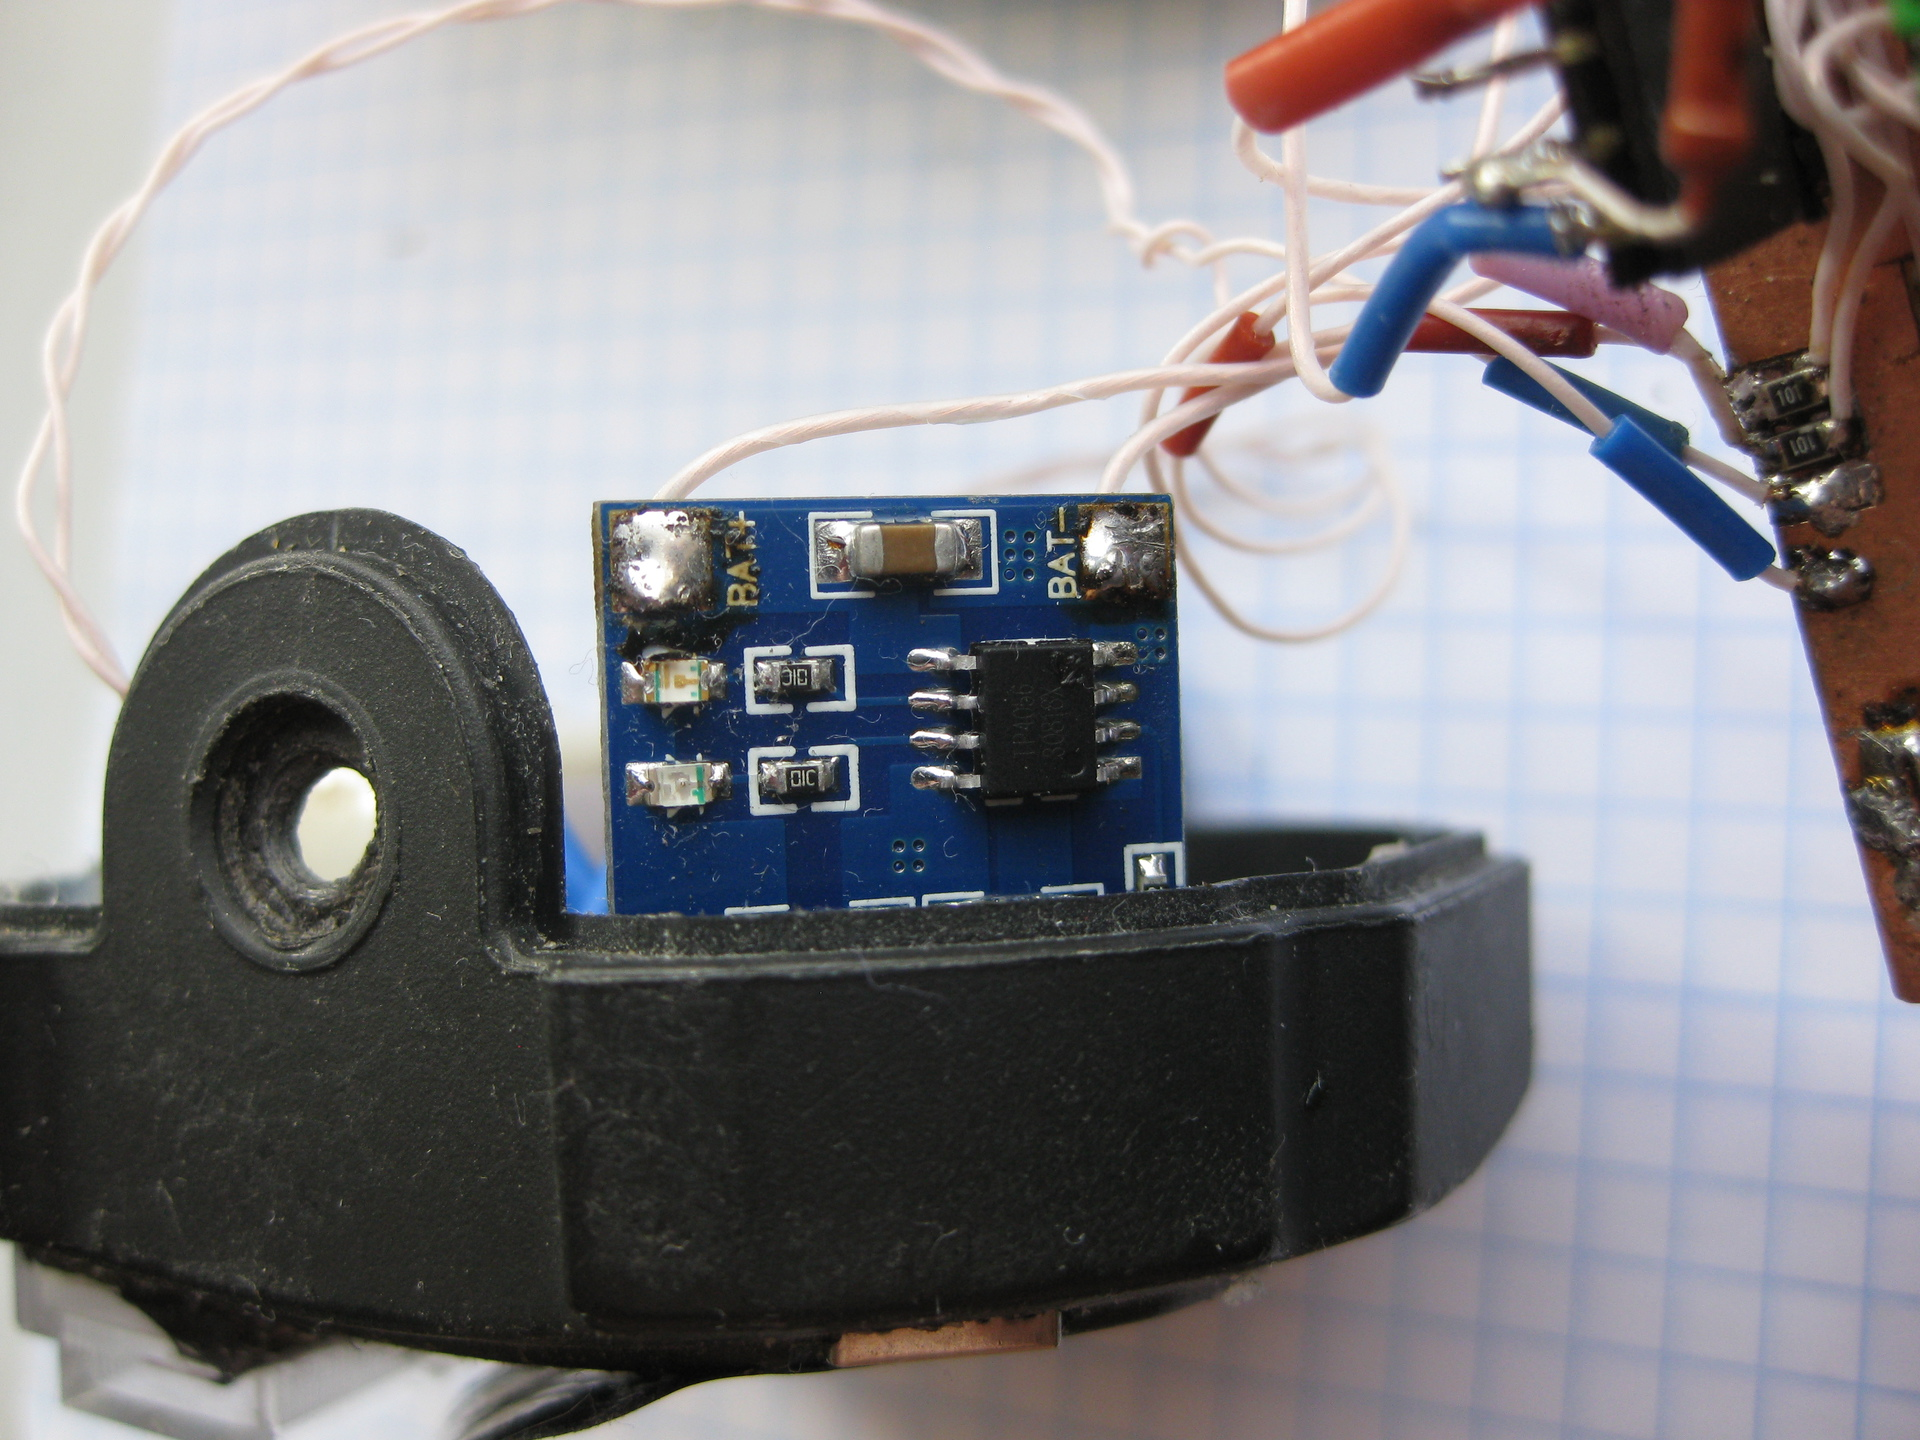 схема автомата разрядки аккумуляторных батарей